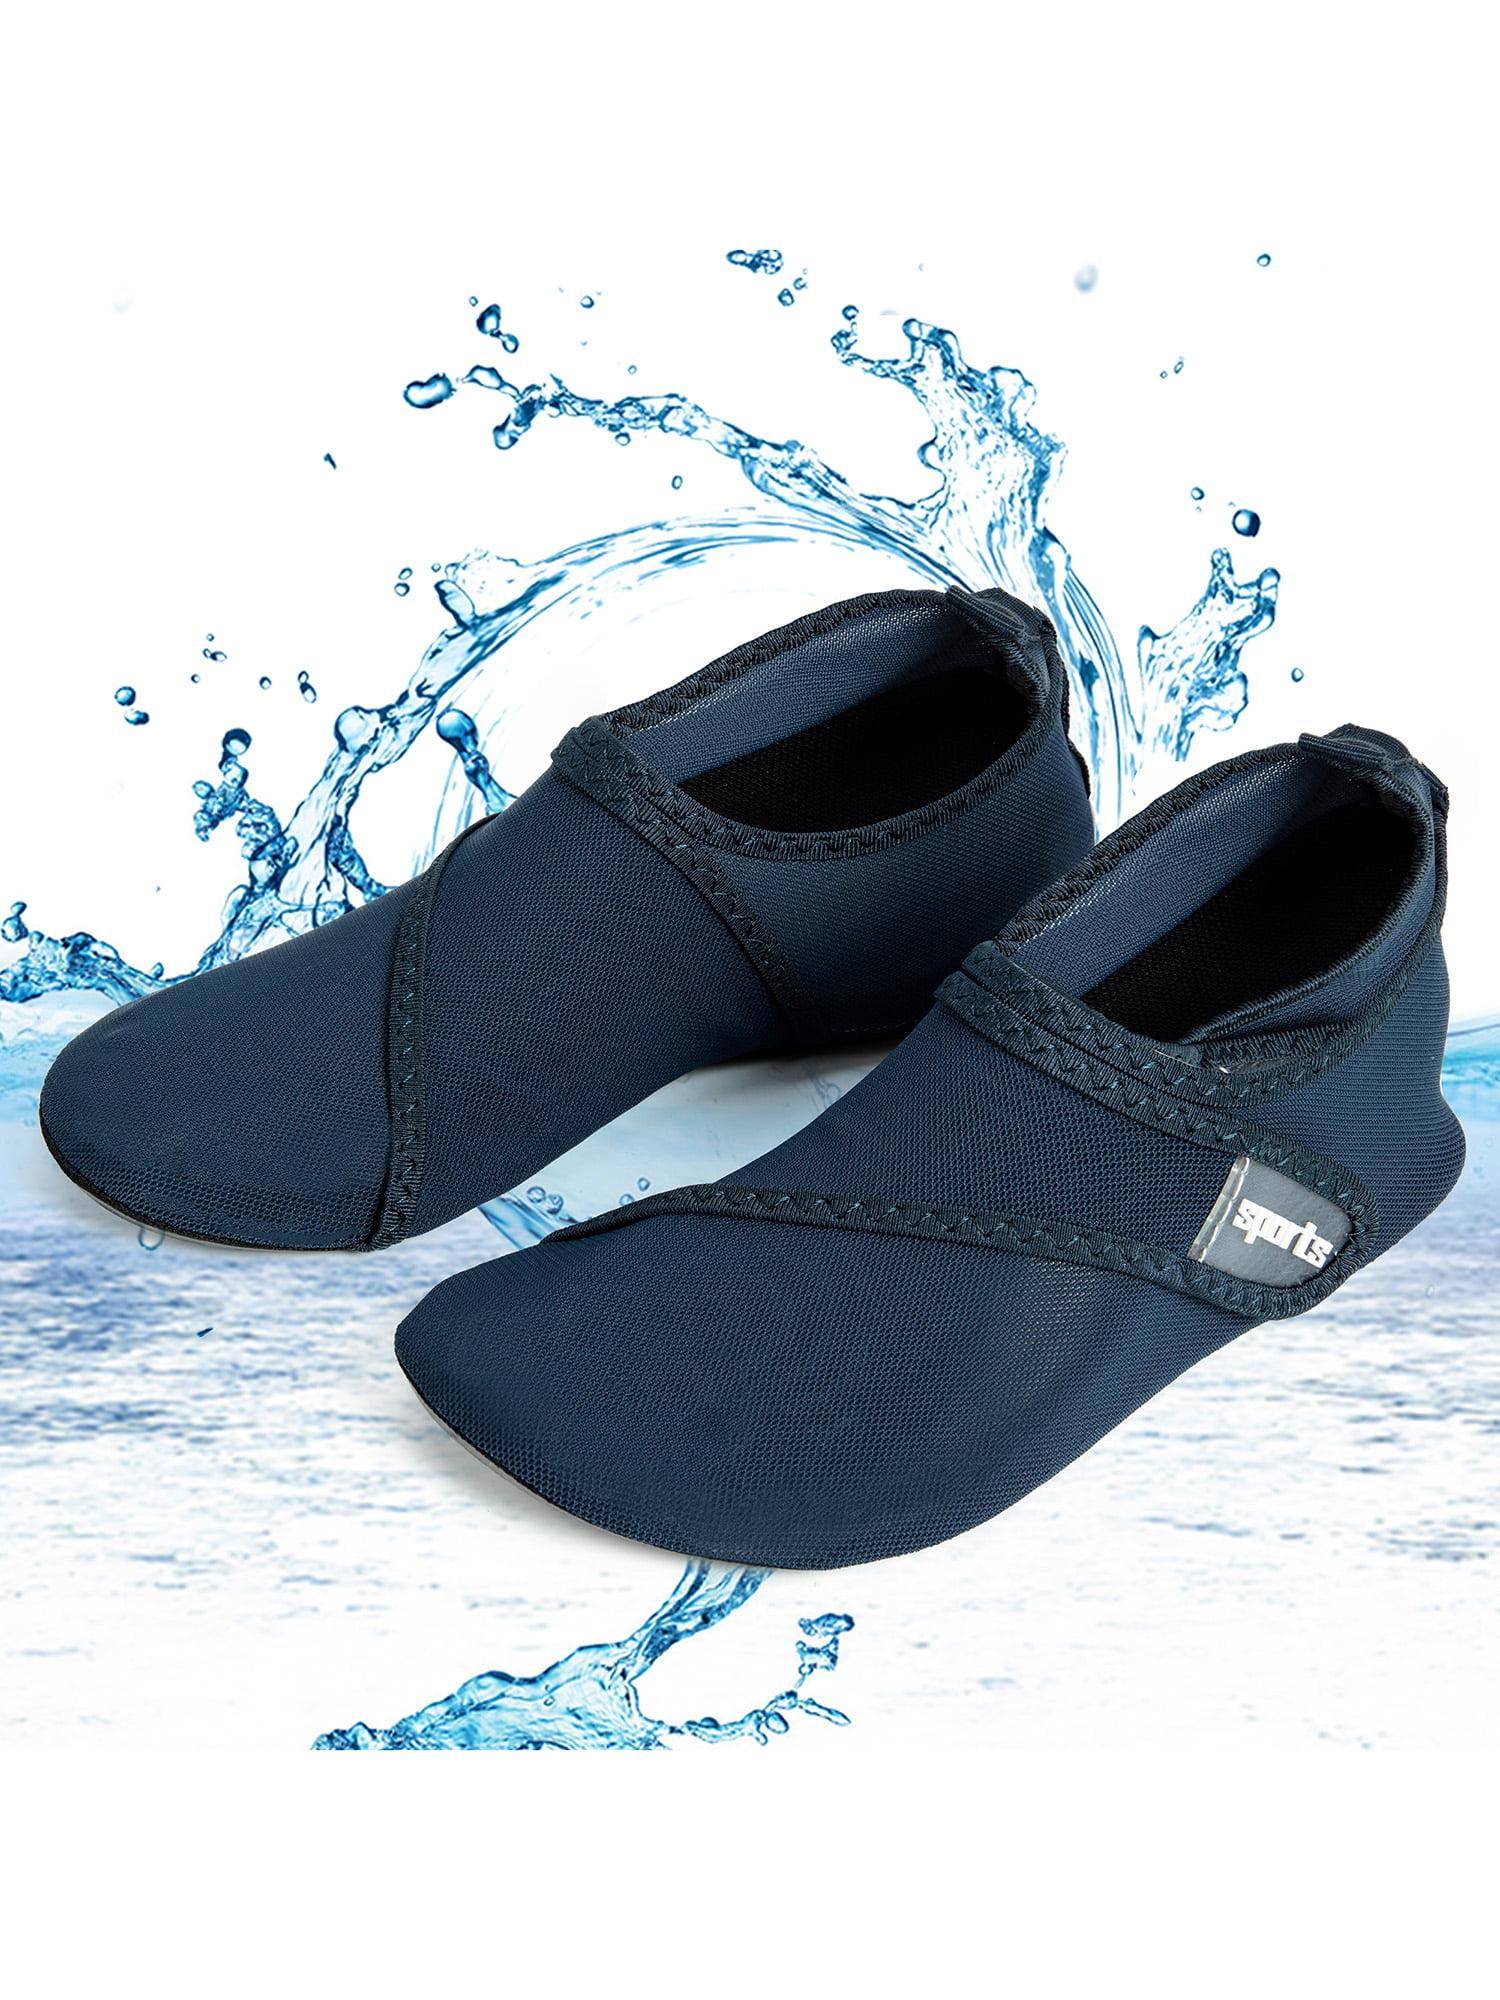 Unisex Aqua Shoes Summer Beach Water Shoes Snorkeling Outdoor Non-slip Shoes